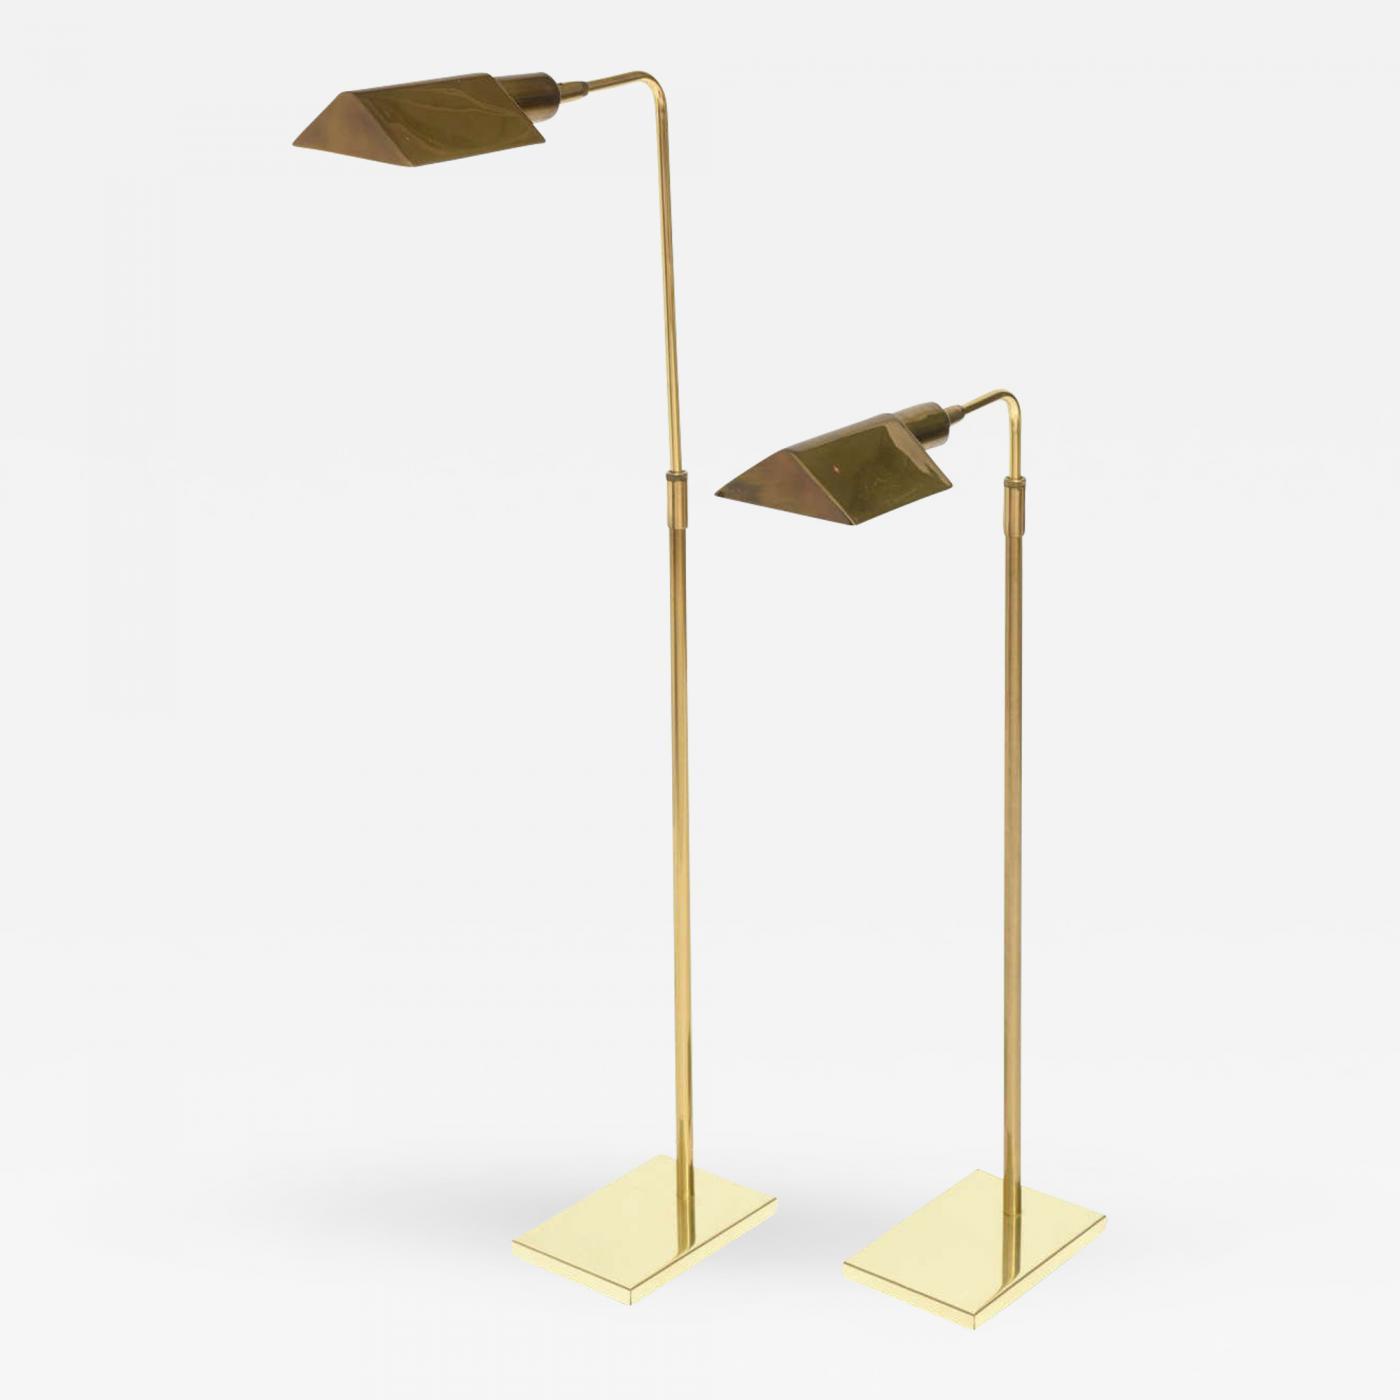 Image of: Cedric Hartman Pair Of Brass Adjustable Pharmacy Floor Lamps In The Style Of Cedric Hartman